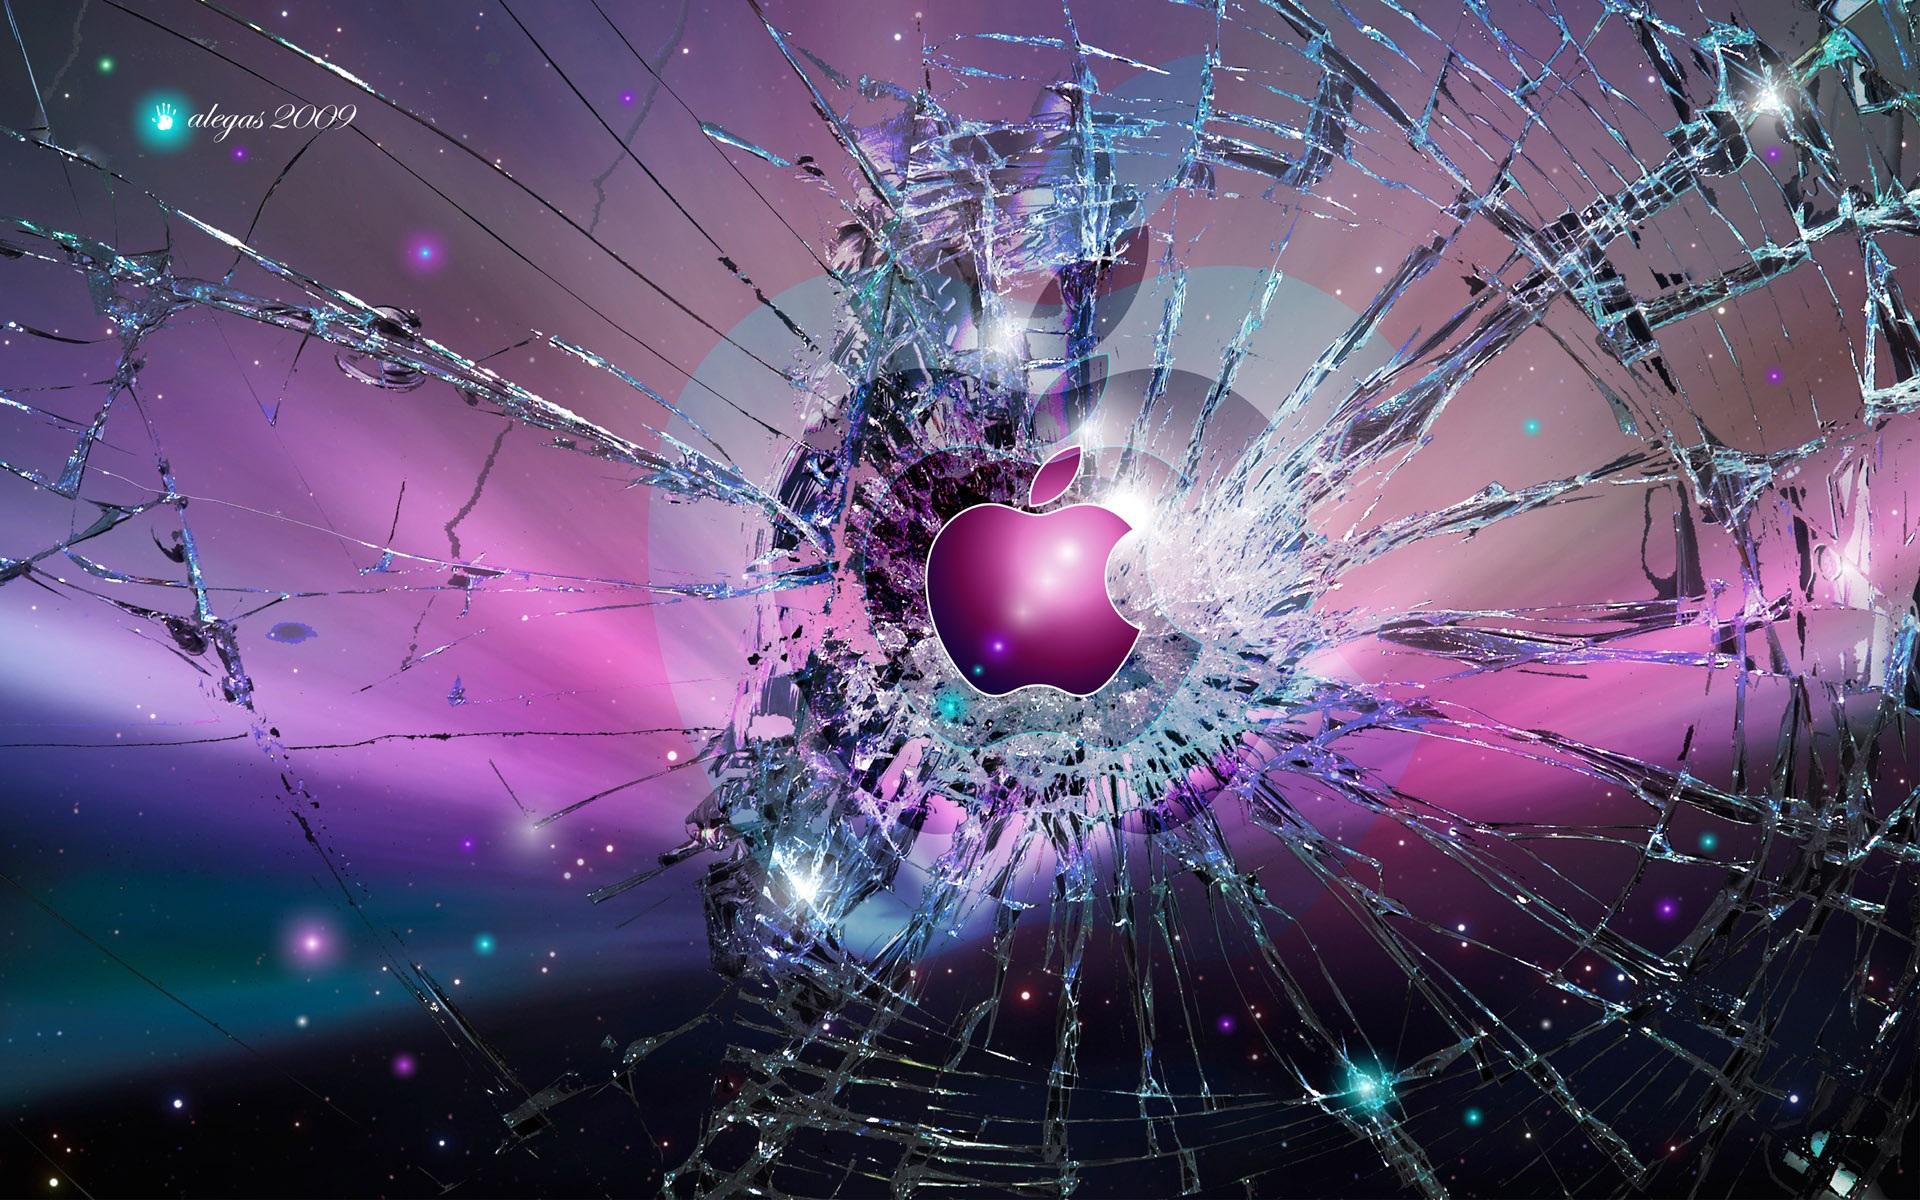 Apple-fond-%C3%A9cran-cass%C3%A9-Fonds-d%C3%A9cran-1920x-wallpaper-wpc9202499